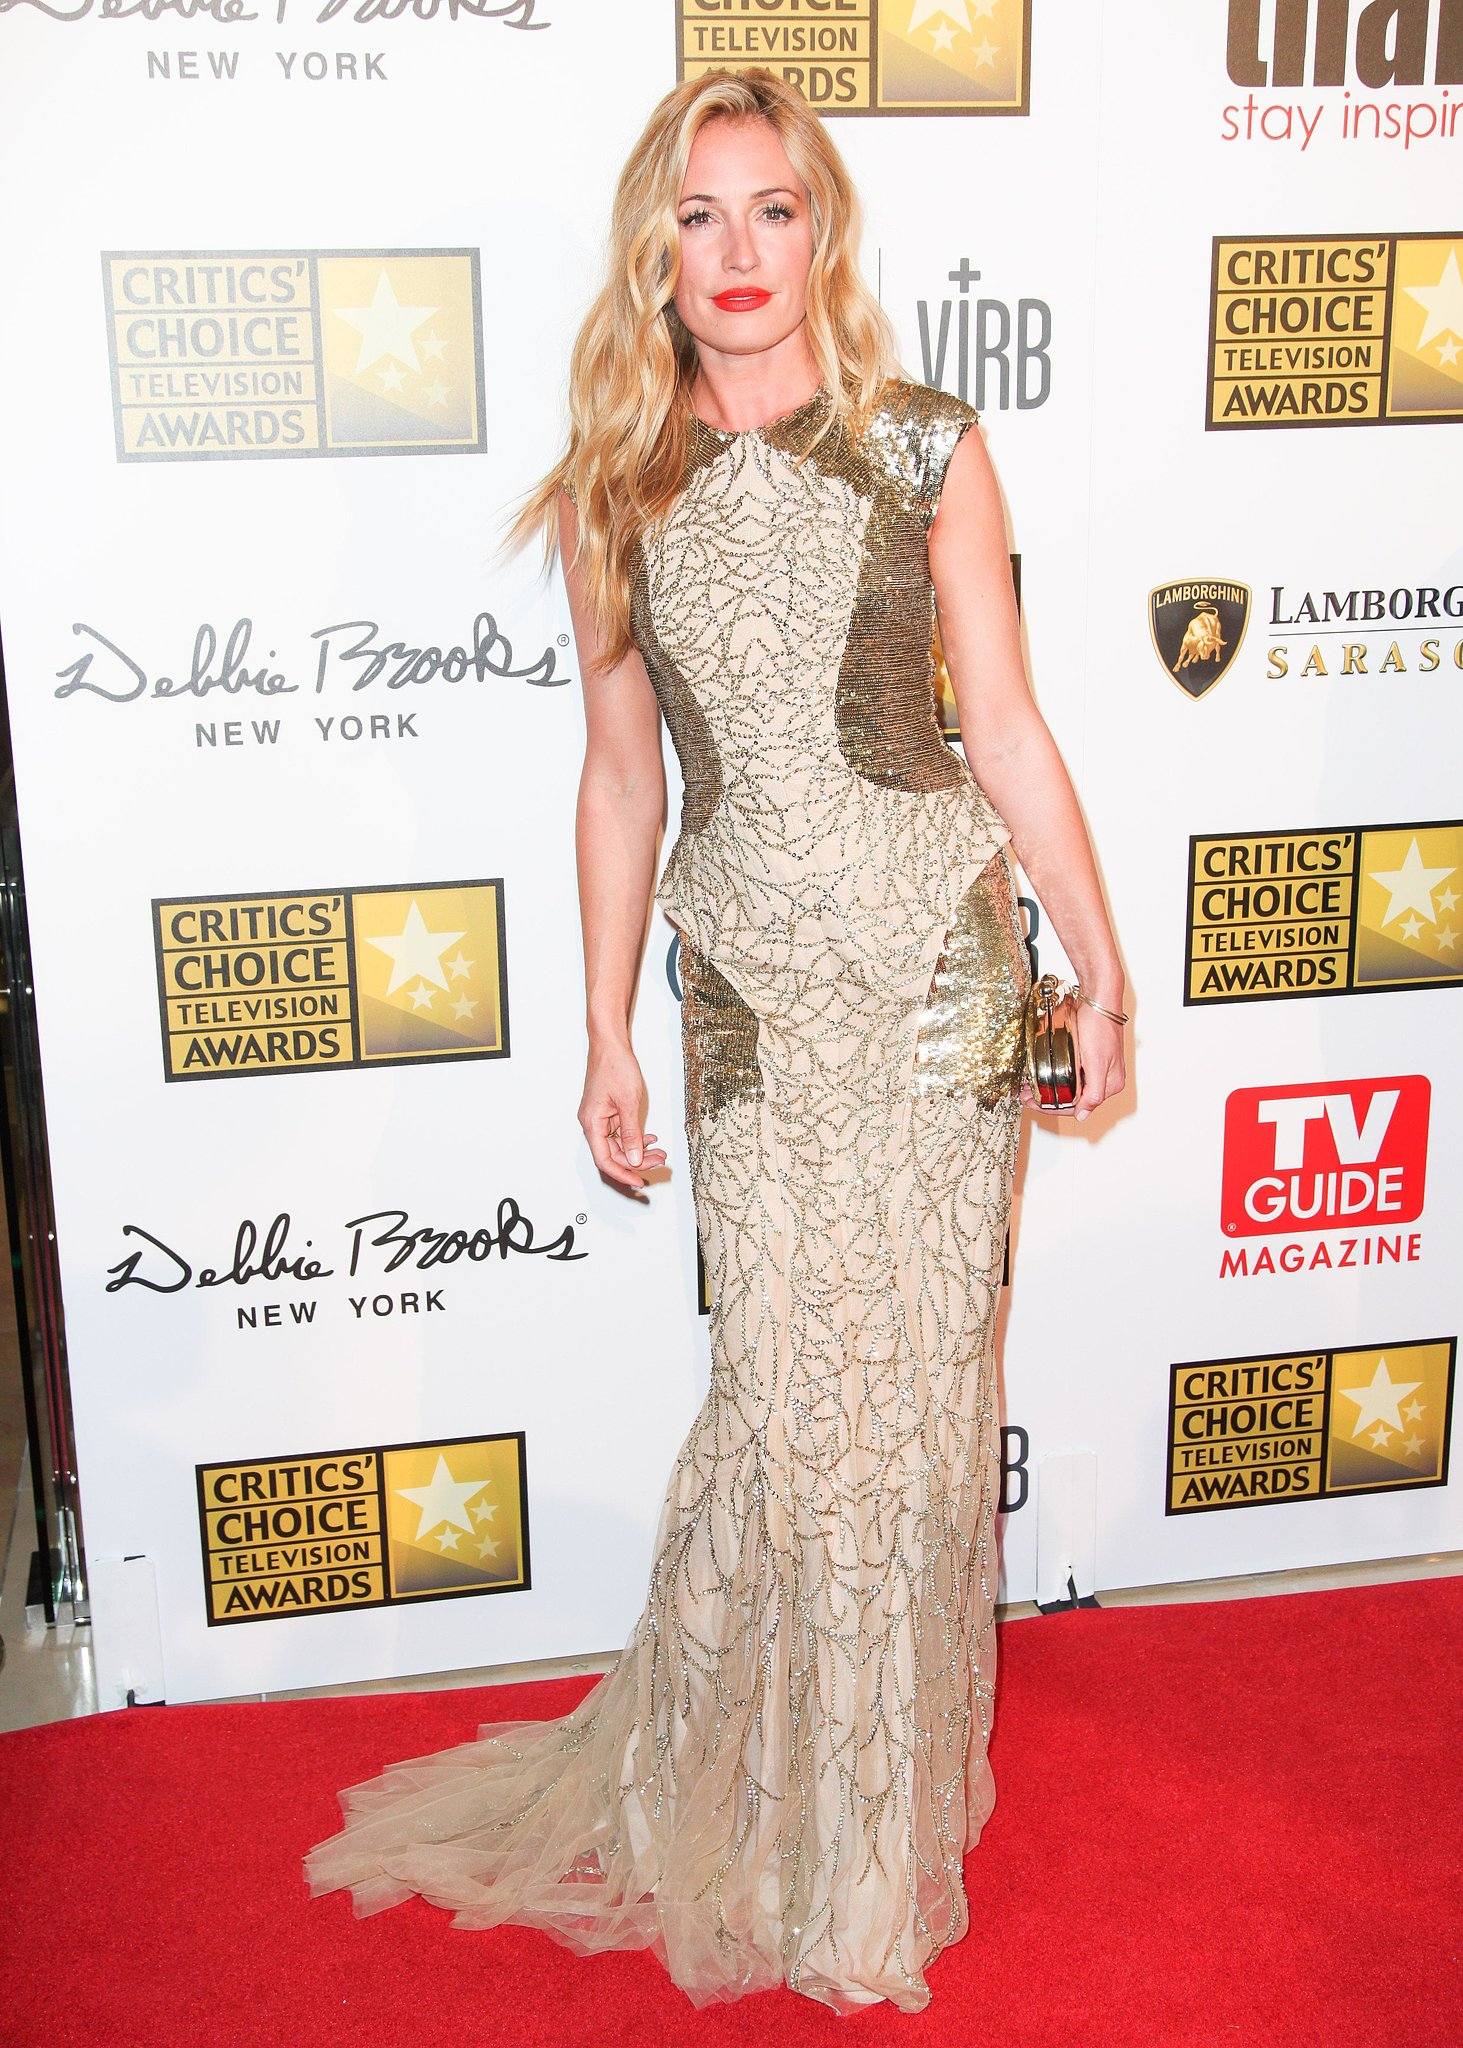 Cat Deeley at the 2013 Critics' Choice Television Awards in Los Angeles.  Source: Aleks Kocev/BFAnyc.com